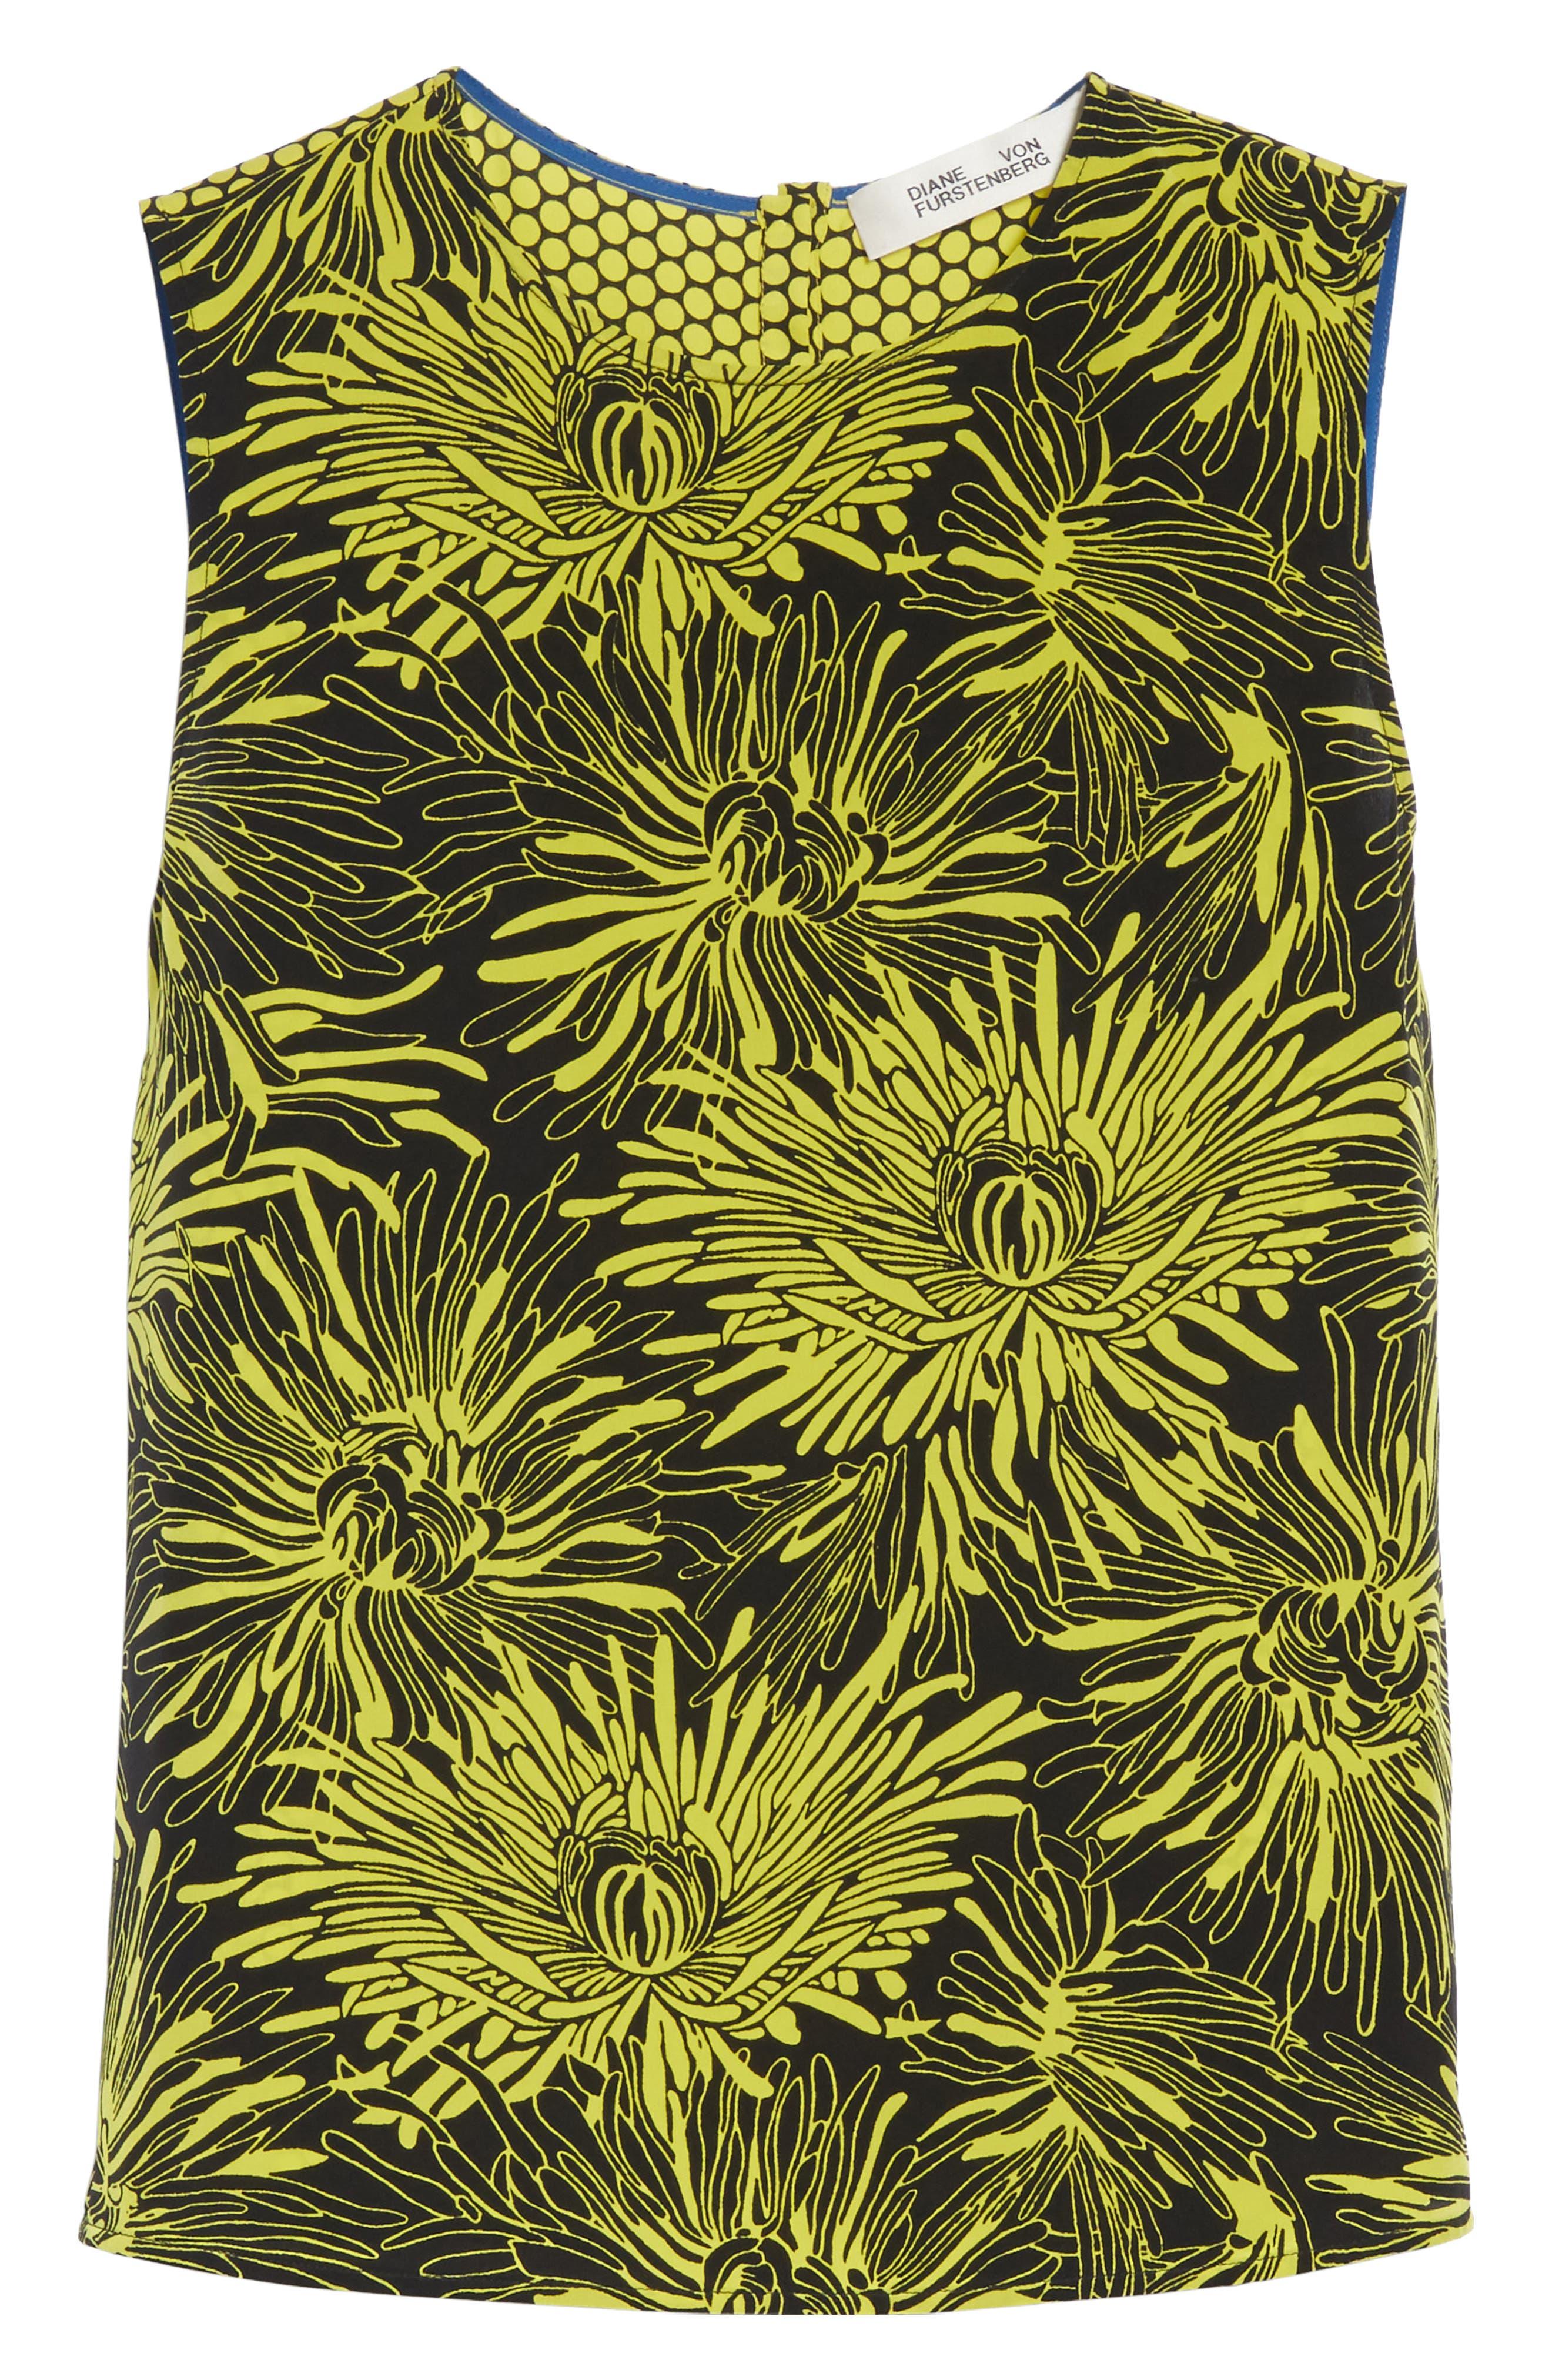 Diane von Furstenberg Floral Print Silk Shell,                             Alternate thumbnail 7, color,                             Worsley Citron/ Rowe Dot